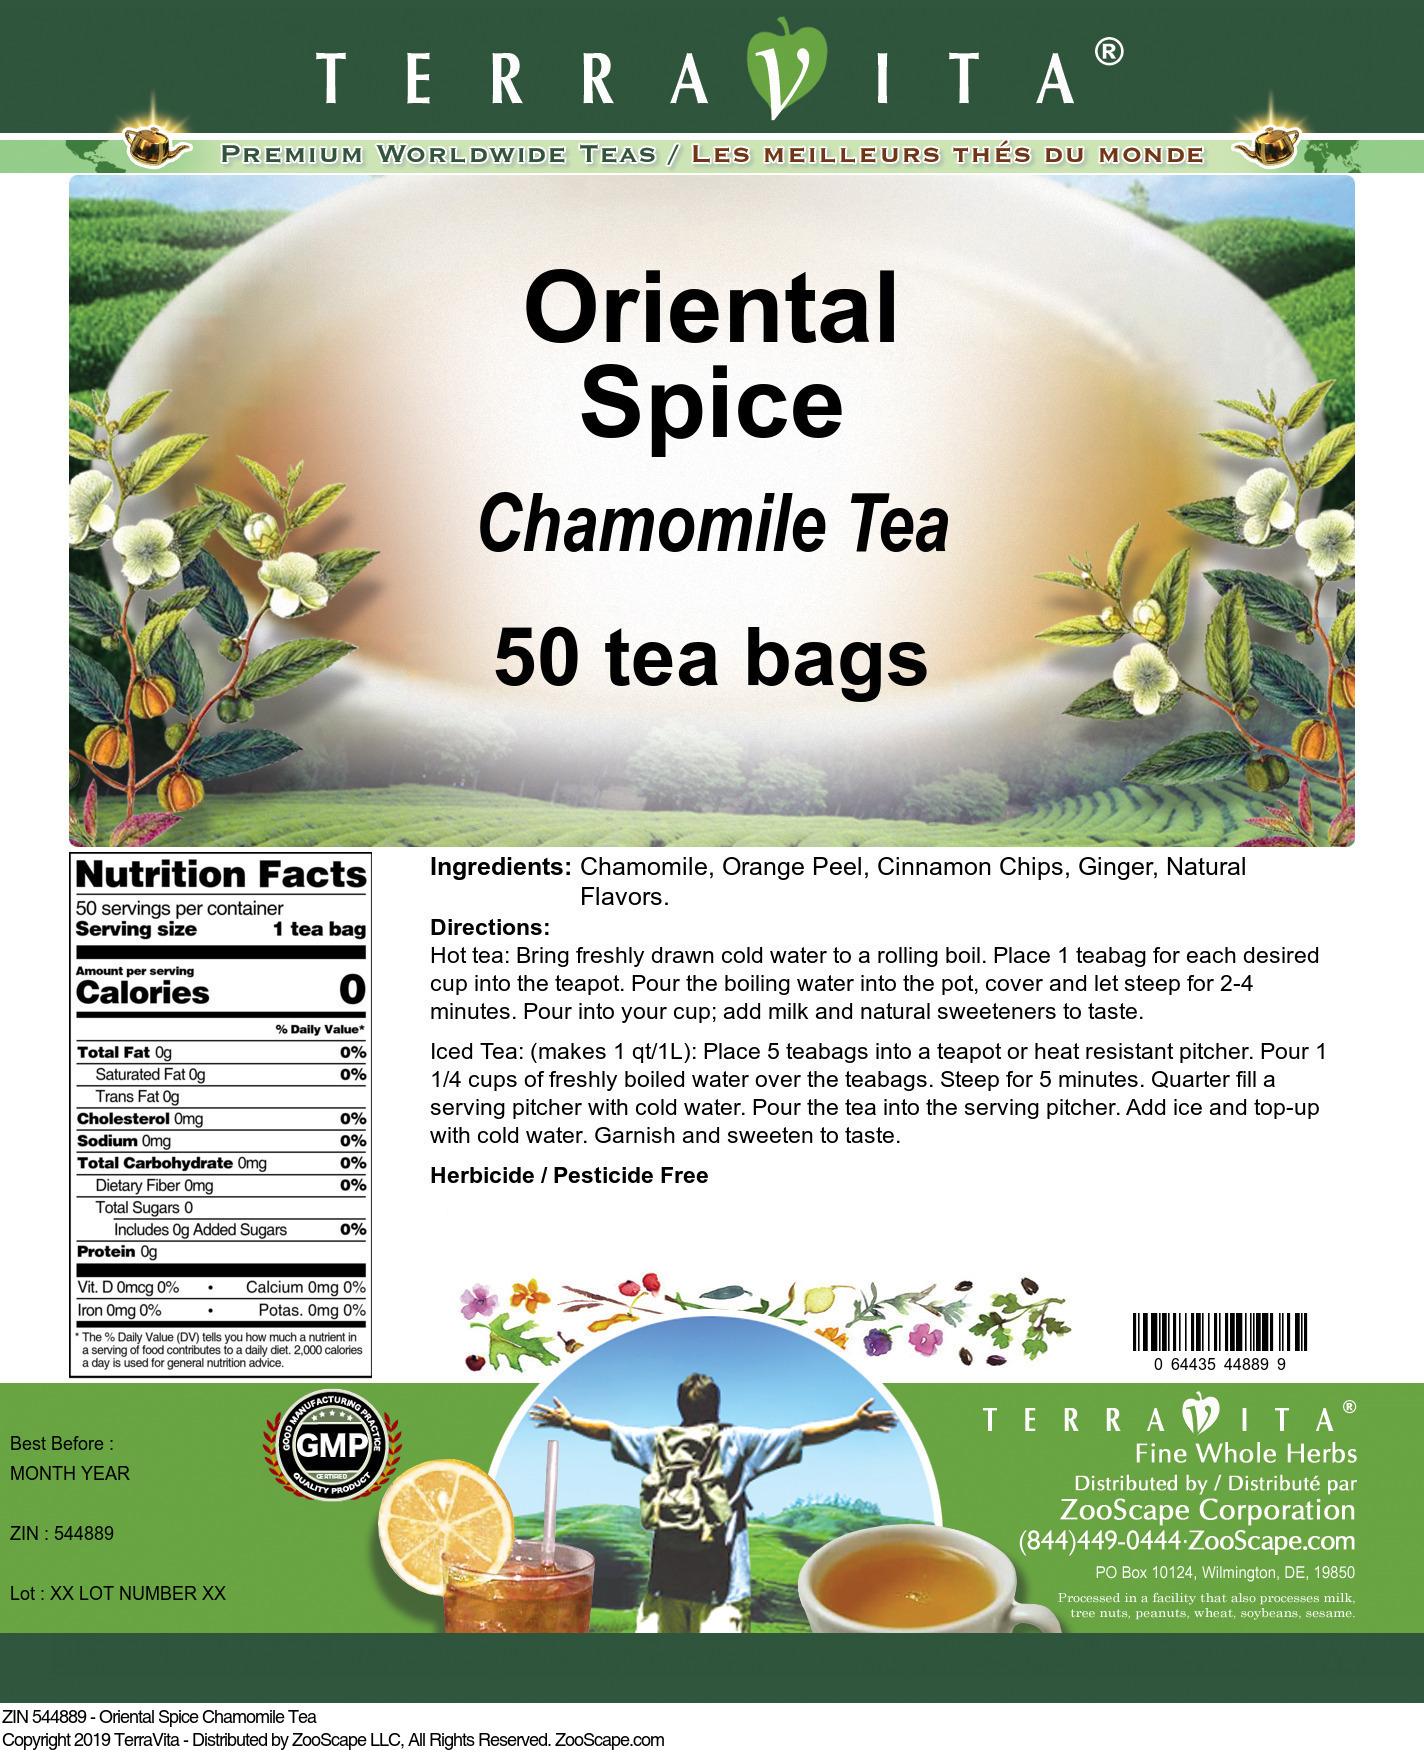 Oriental Spice Chamomile Tea